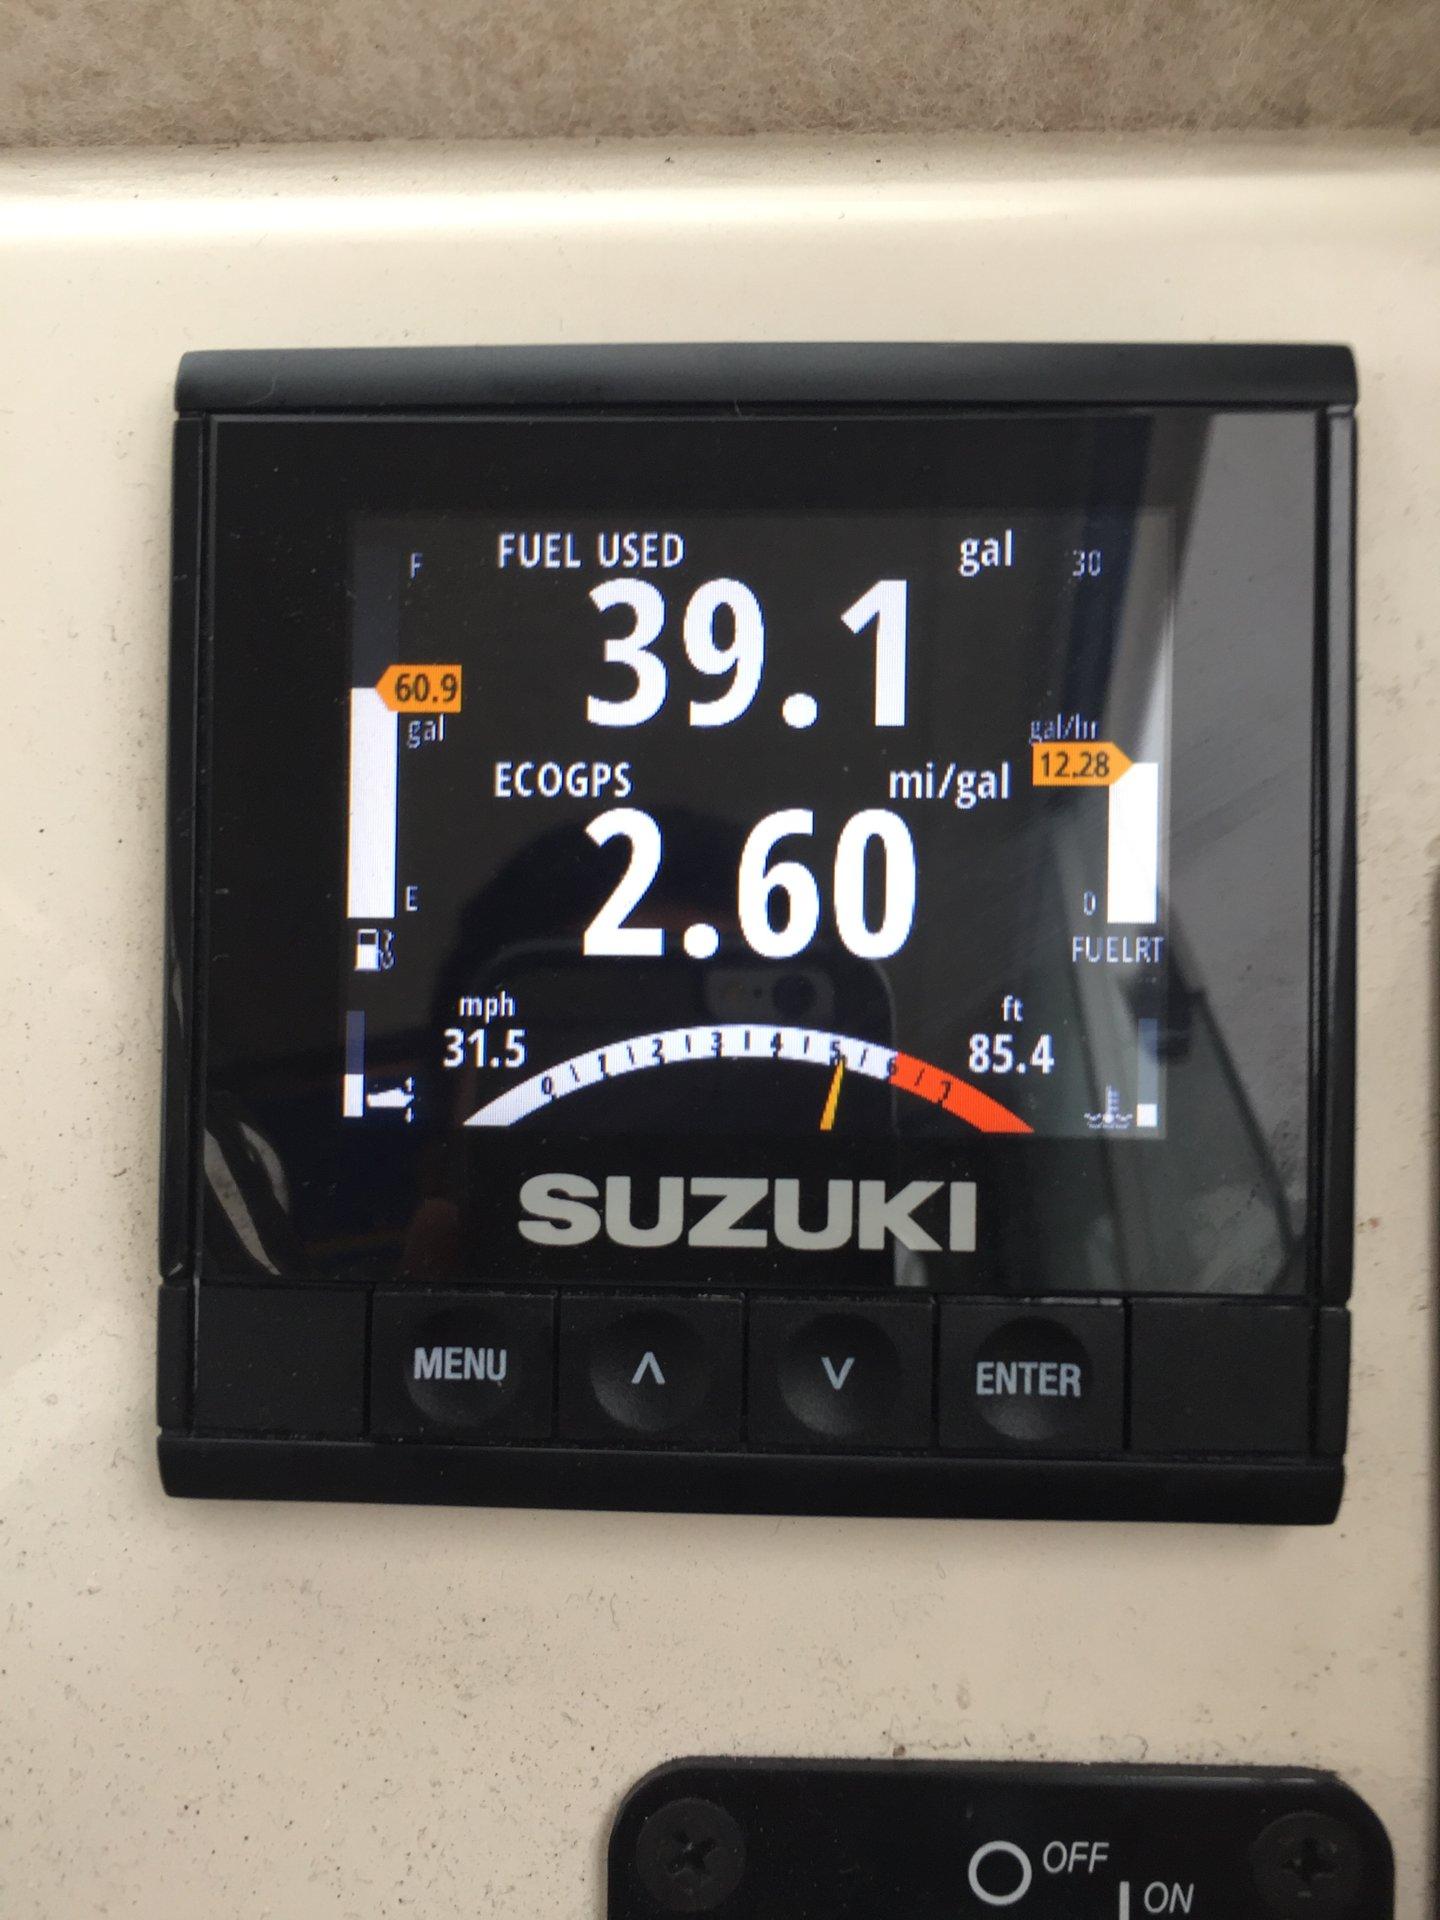 Oil Level Sensor >> 2016 Suzuki df200apxw $13,000 obo | Bloodydecks